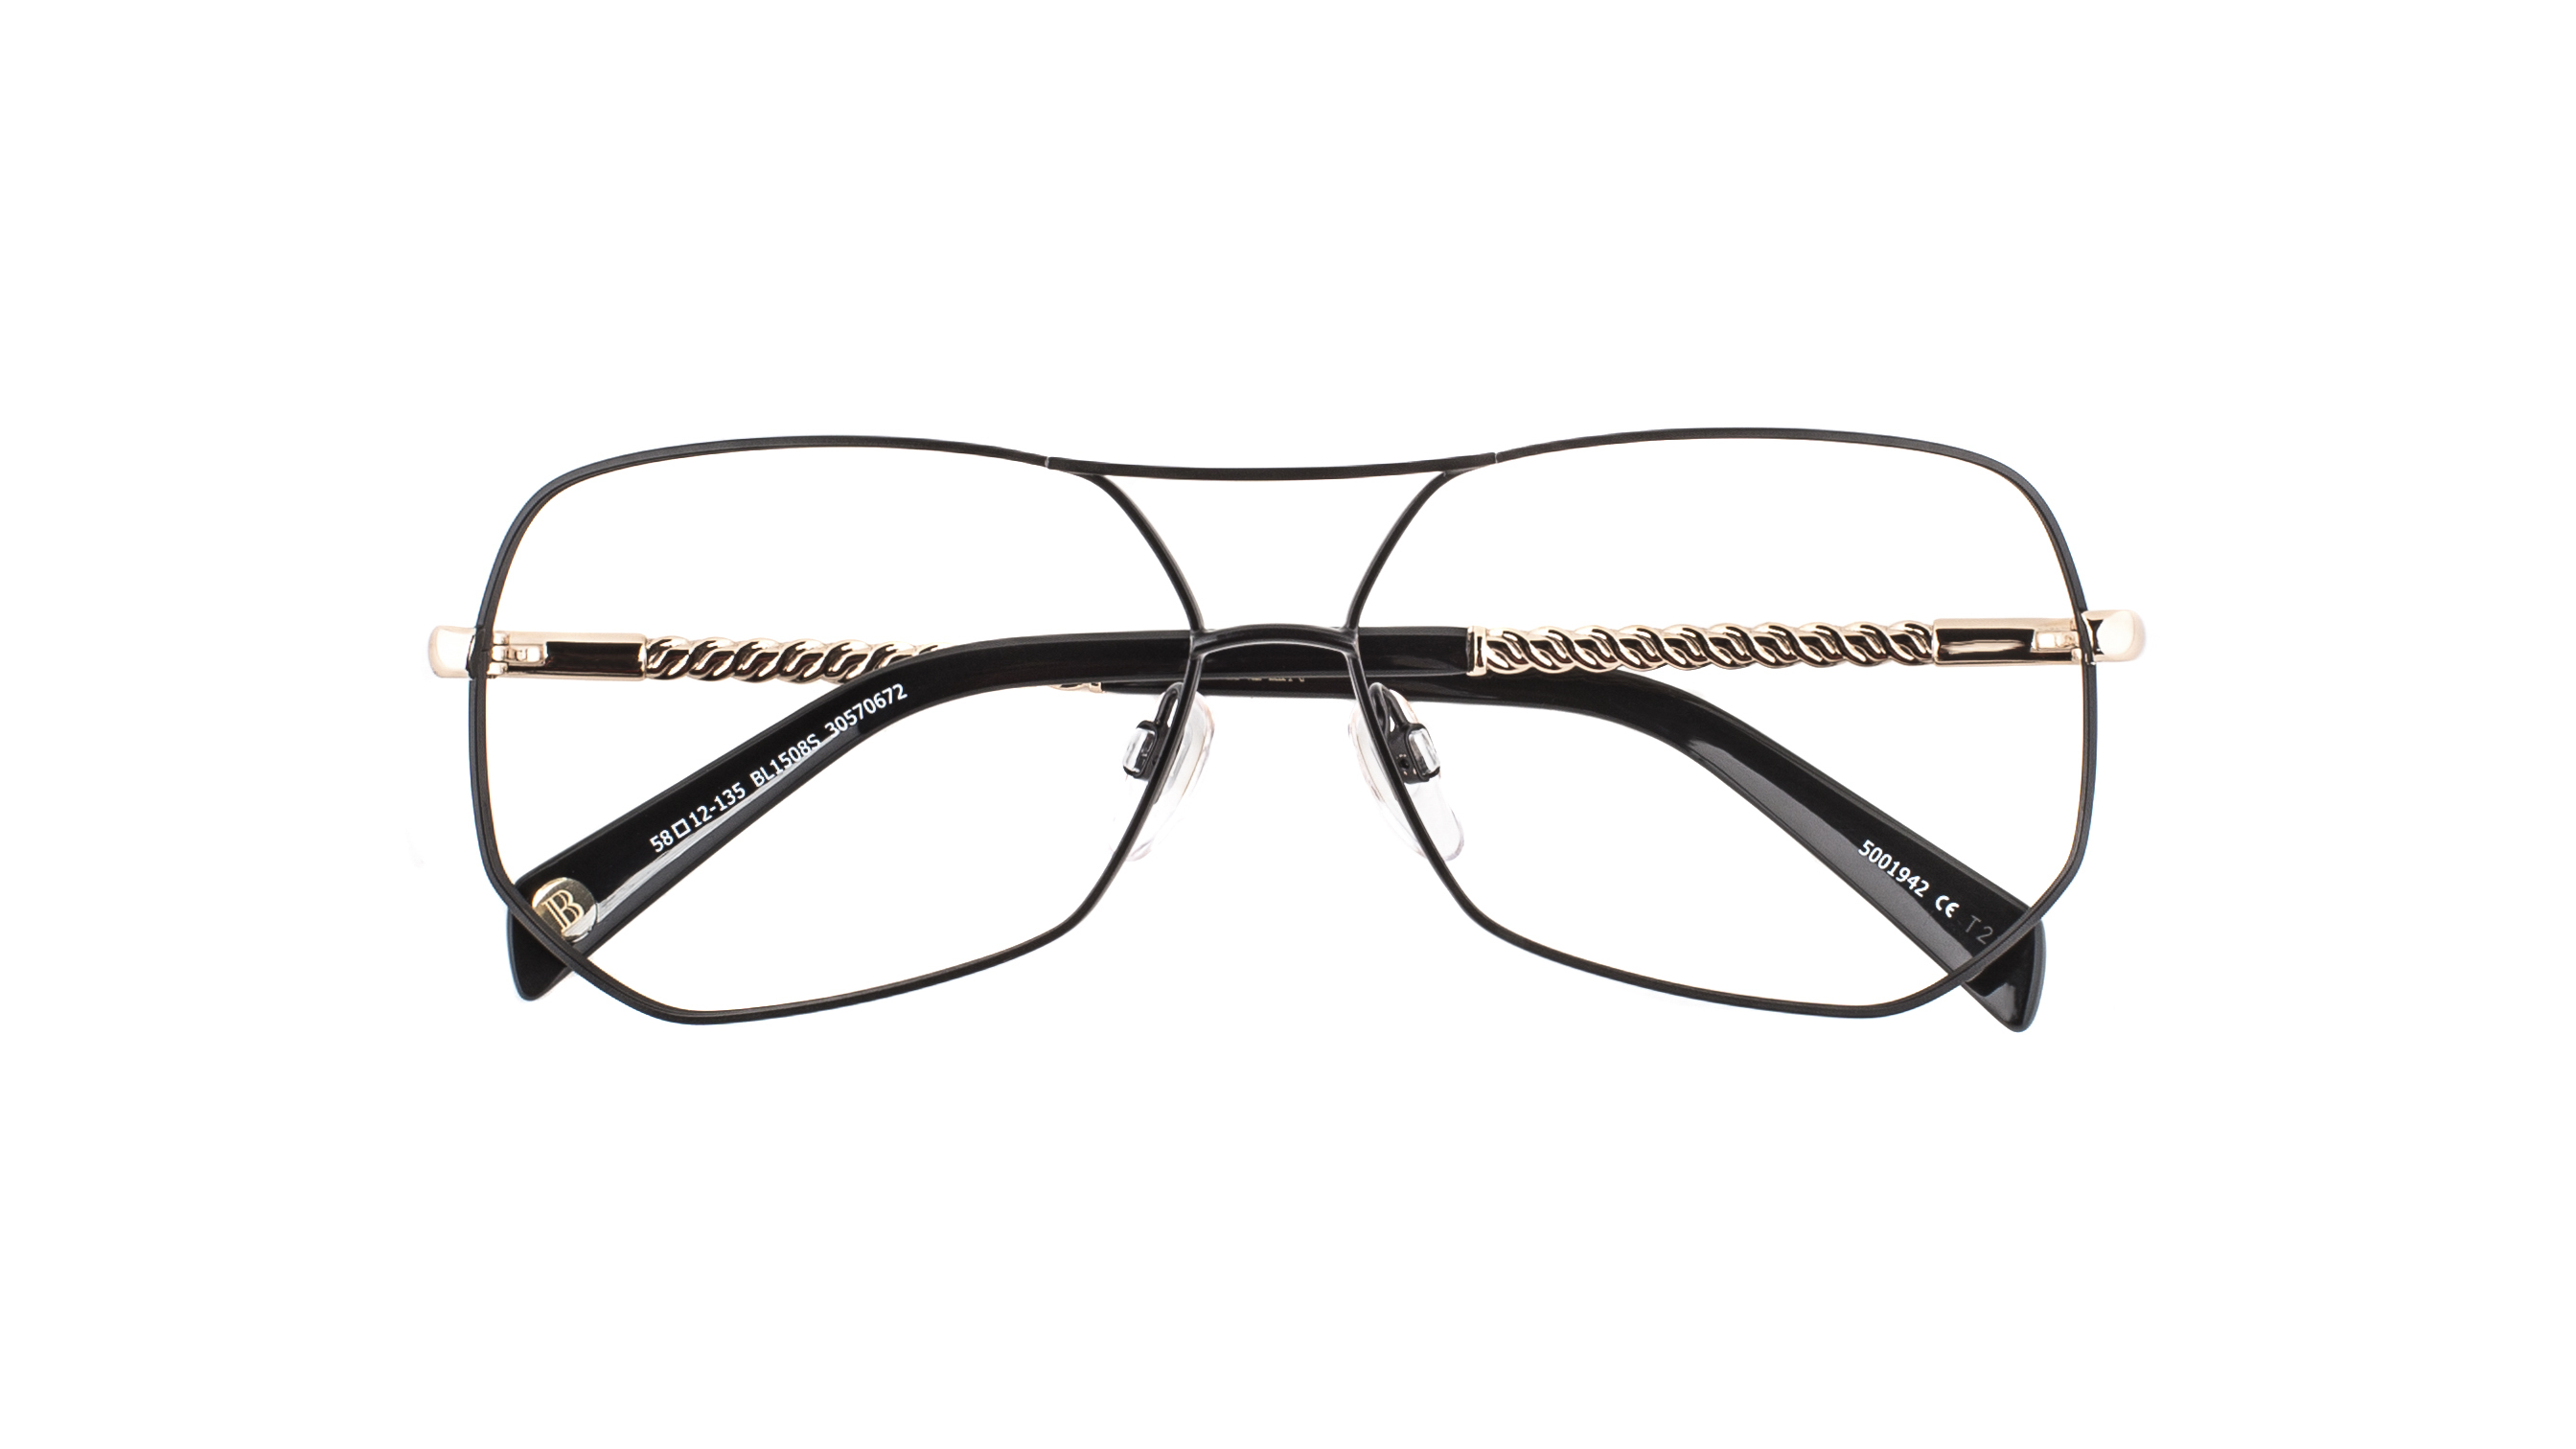 Balmain x Specsavers BL158S 30570672 - RRP 2 pairs single vision $459 (2)